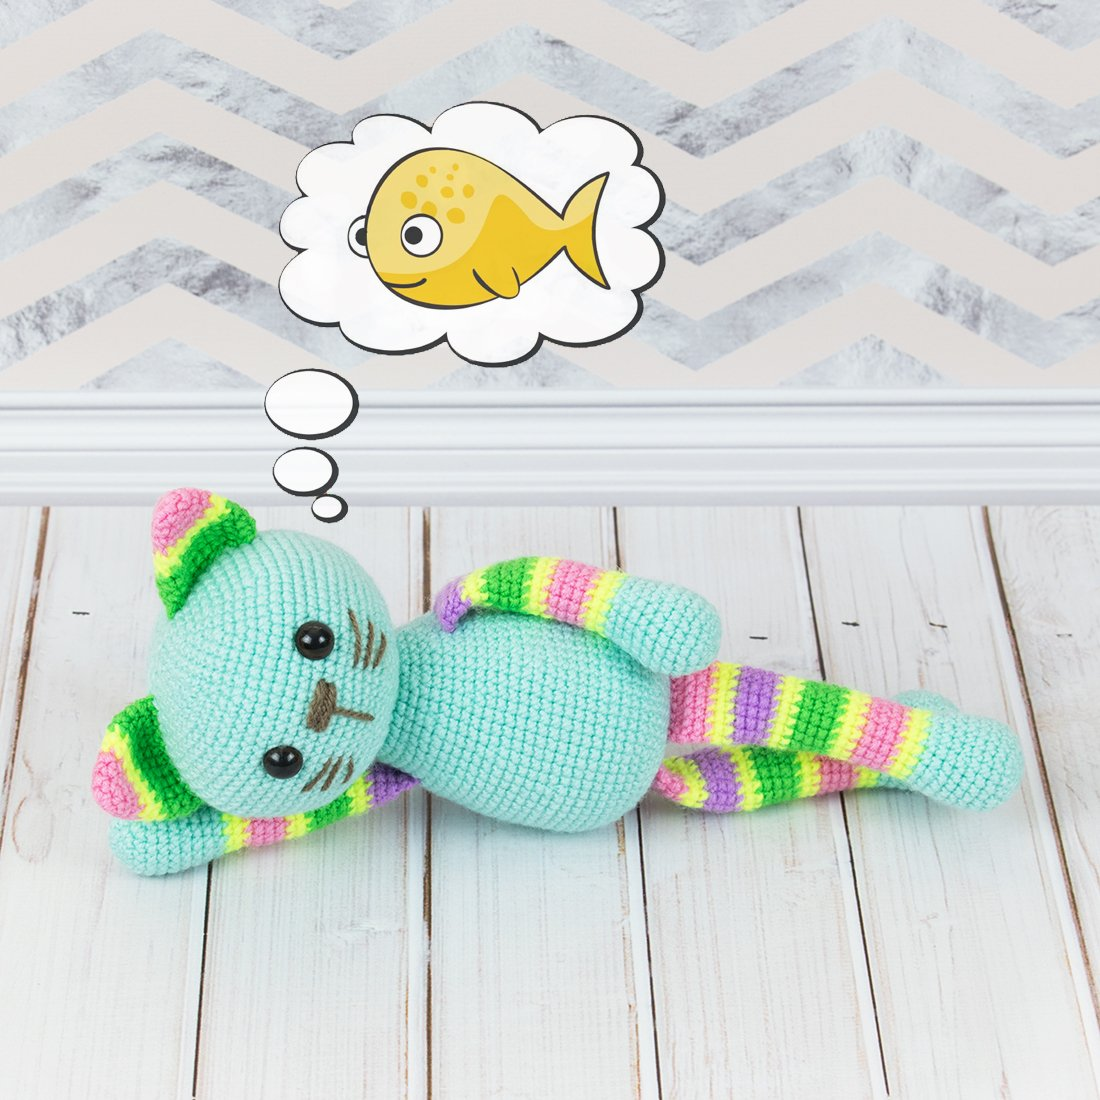 Amigurumi Toy Sheep Free Crochet Pattern – Crochetfuldiy.com   1100x1100